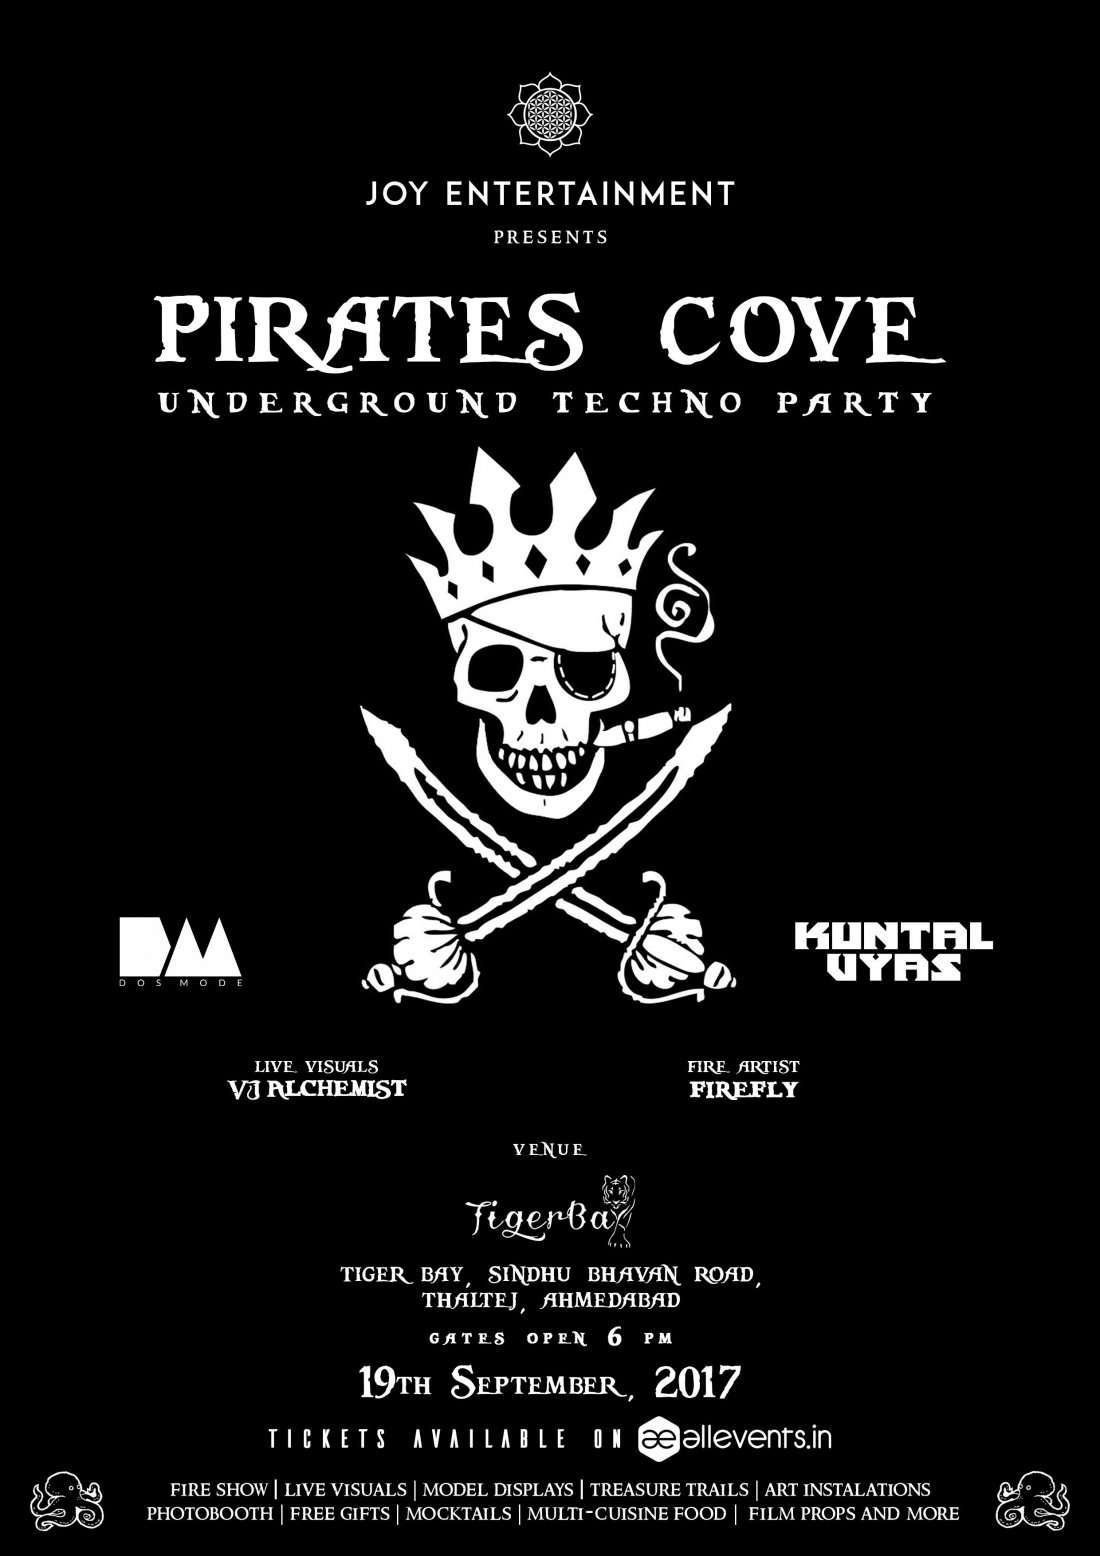 Pirates Cove Open Air Techno Party